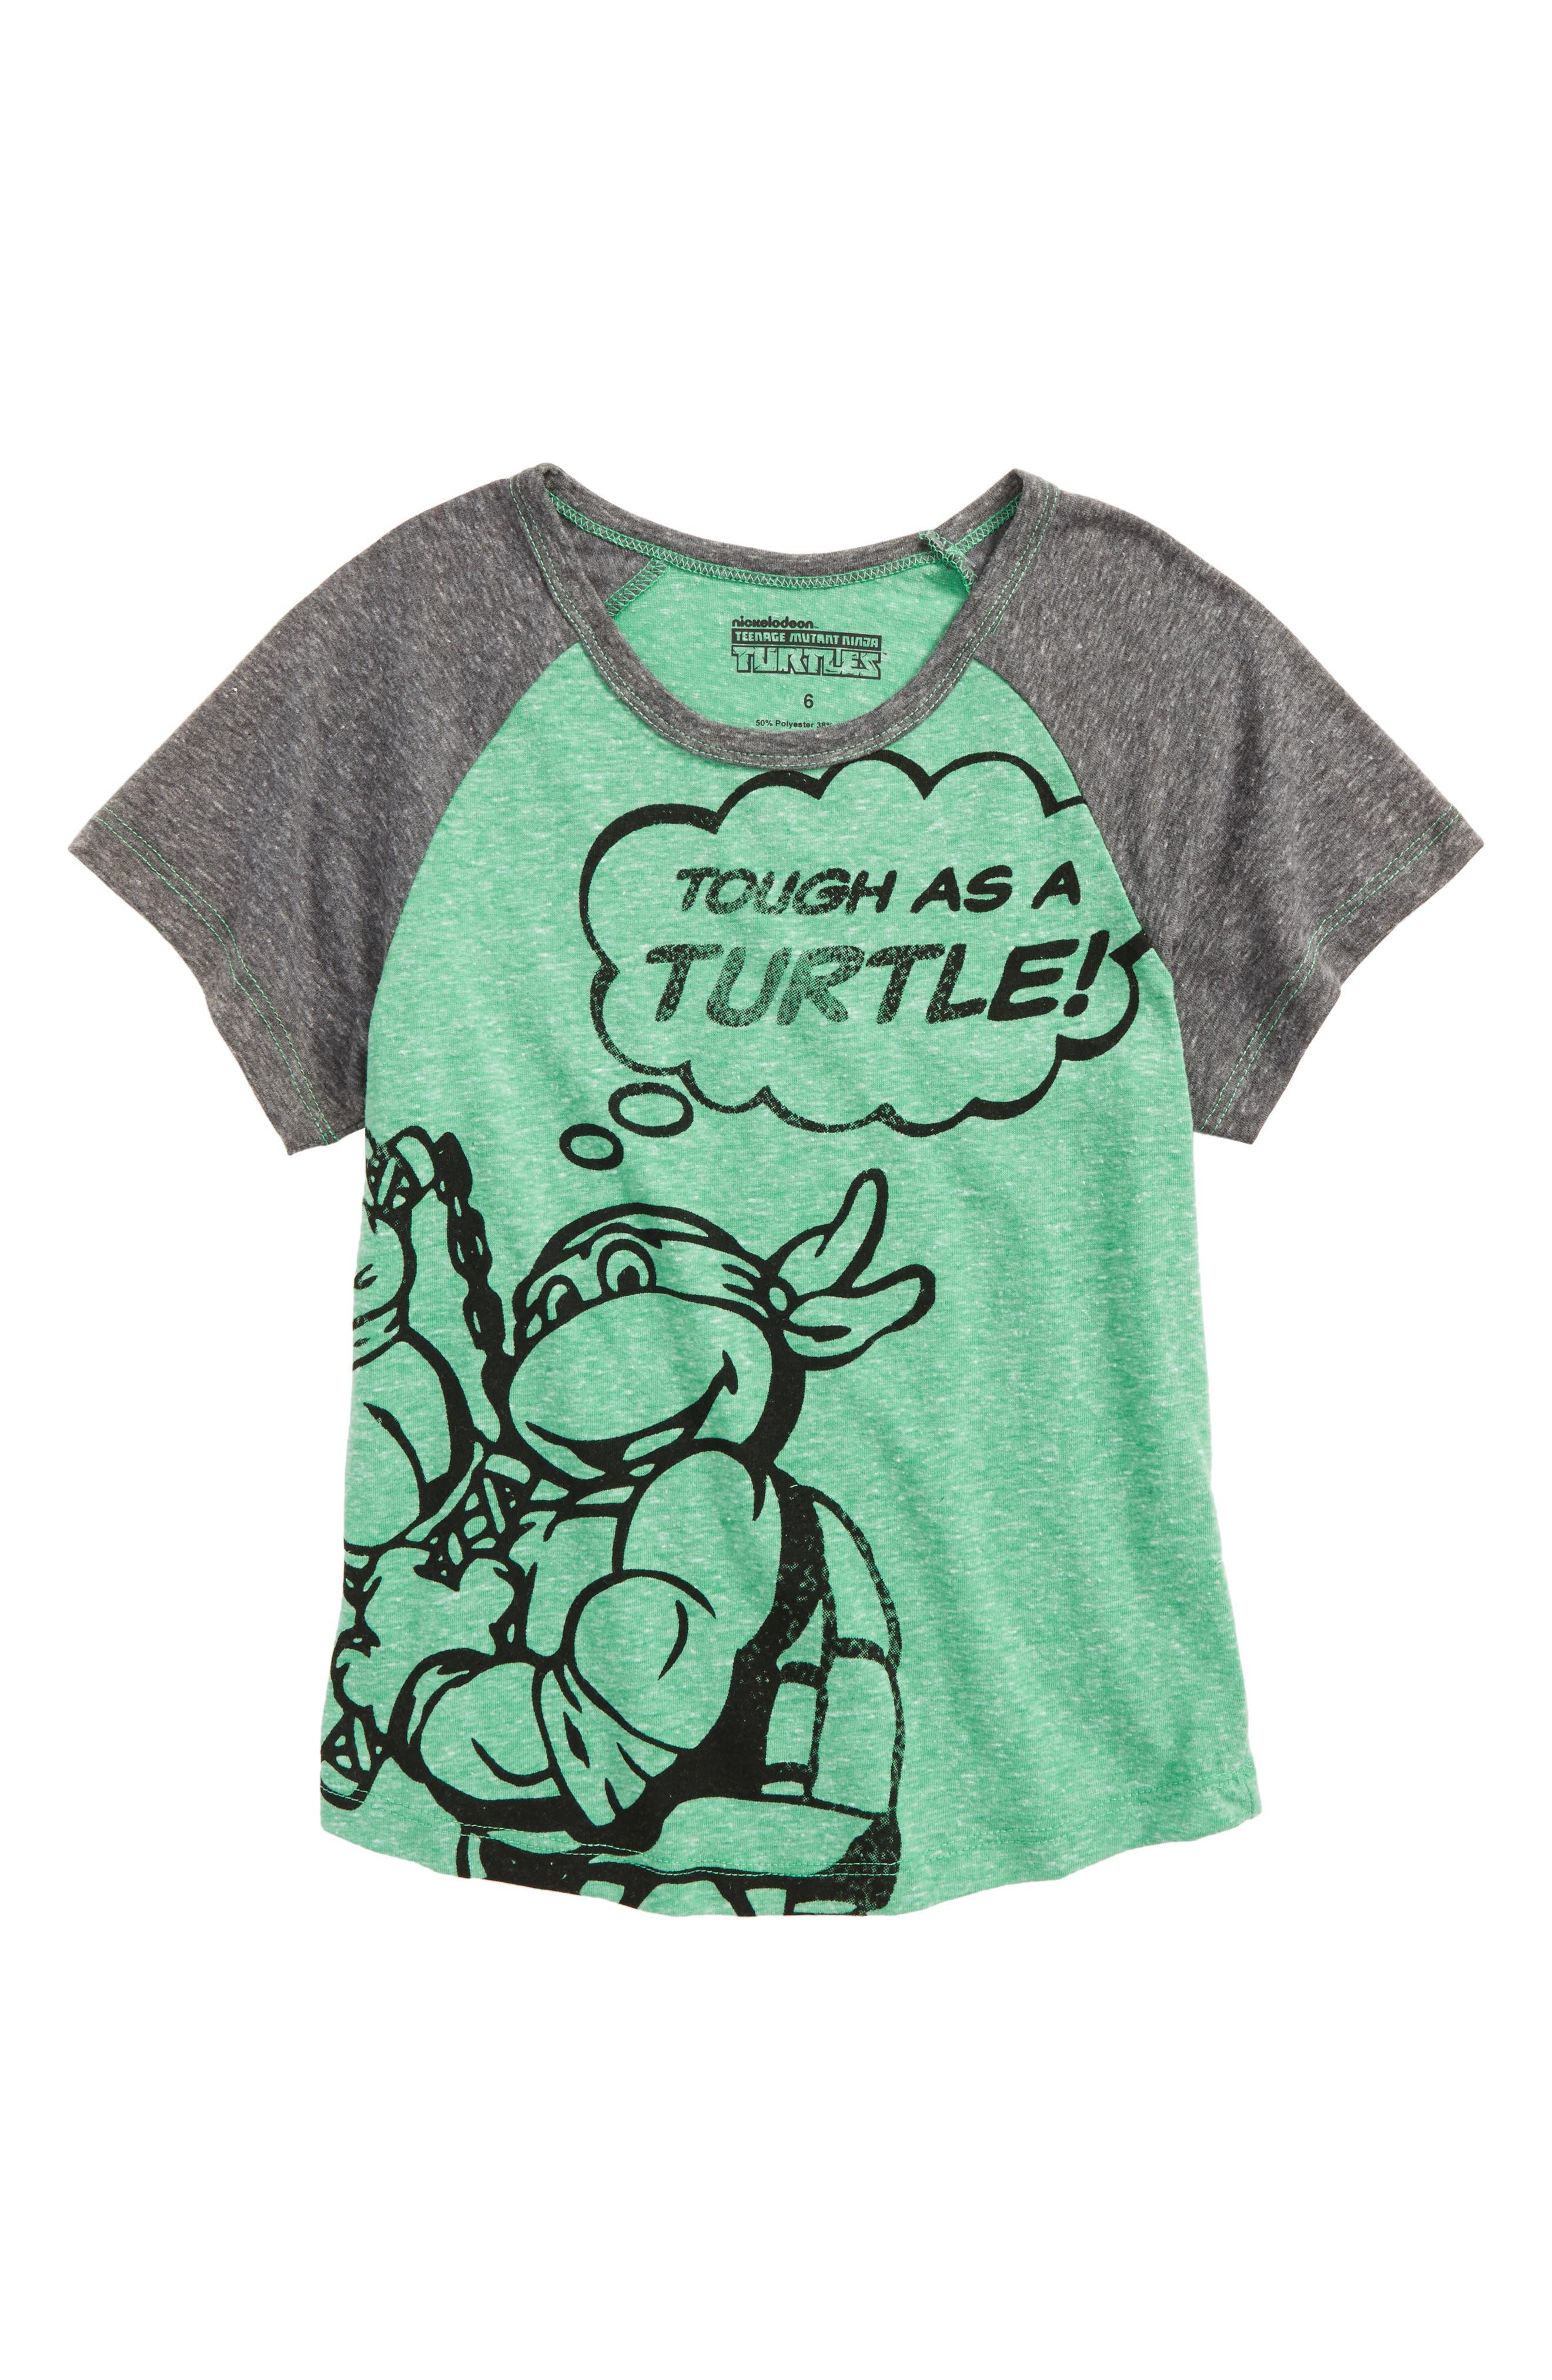 TMNT - Tough as a Turtle Graphic T-Shirt,                             Main thumbnail 1, color,                             Green